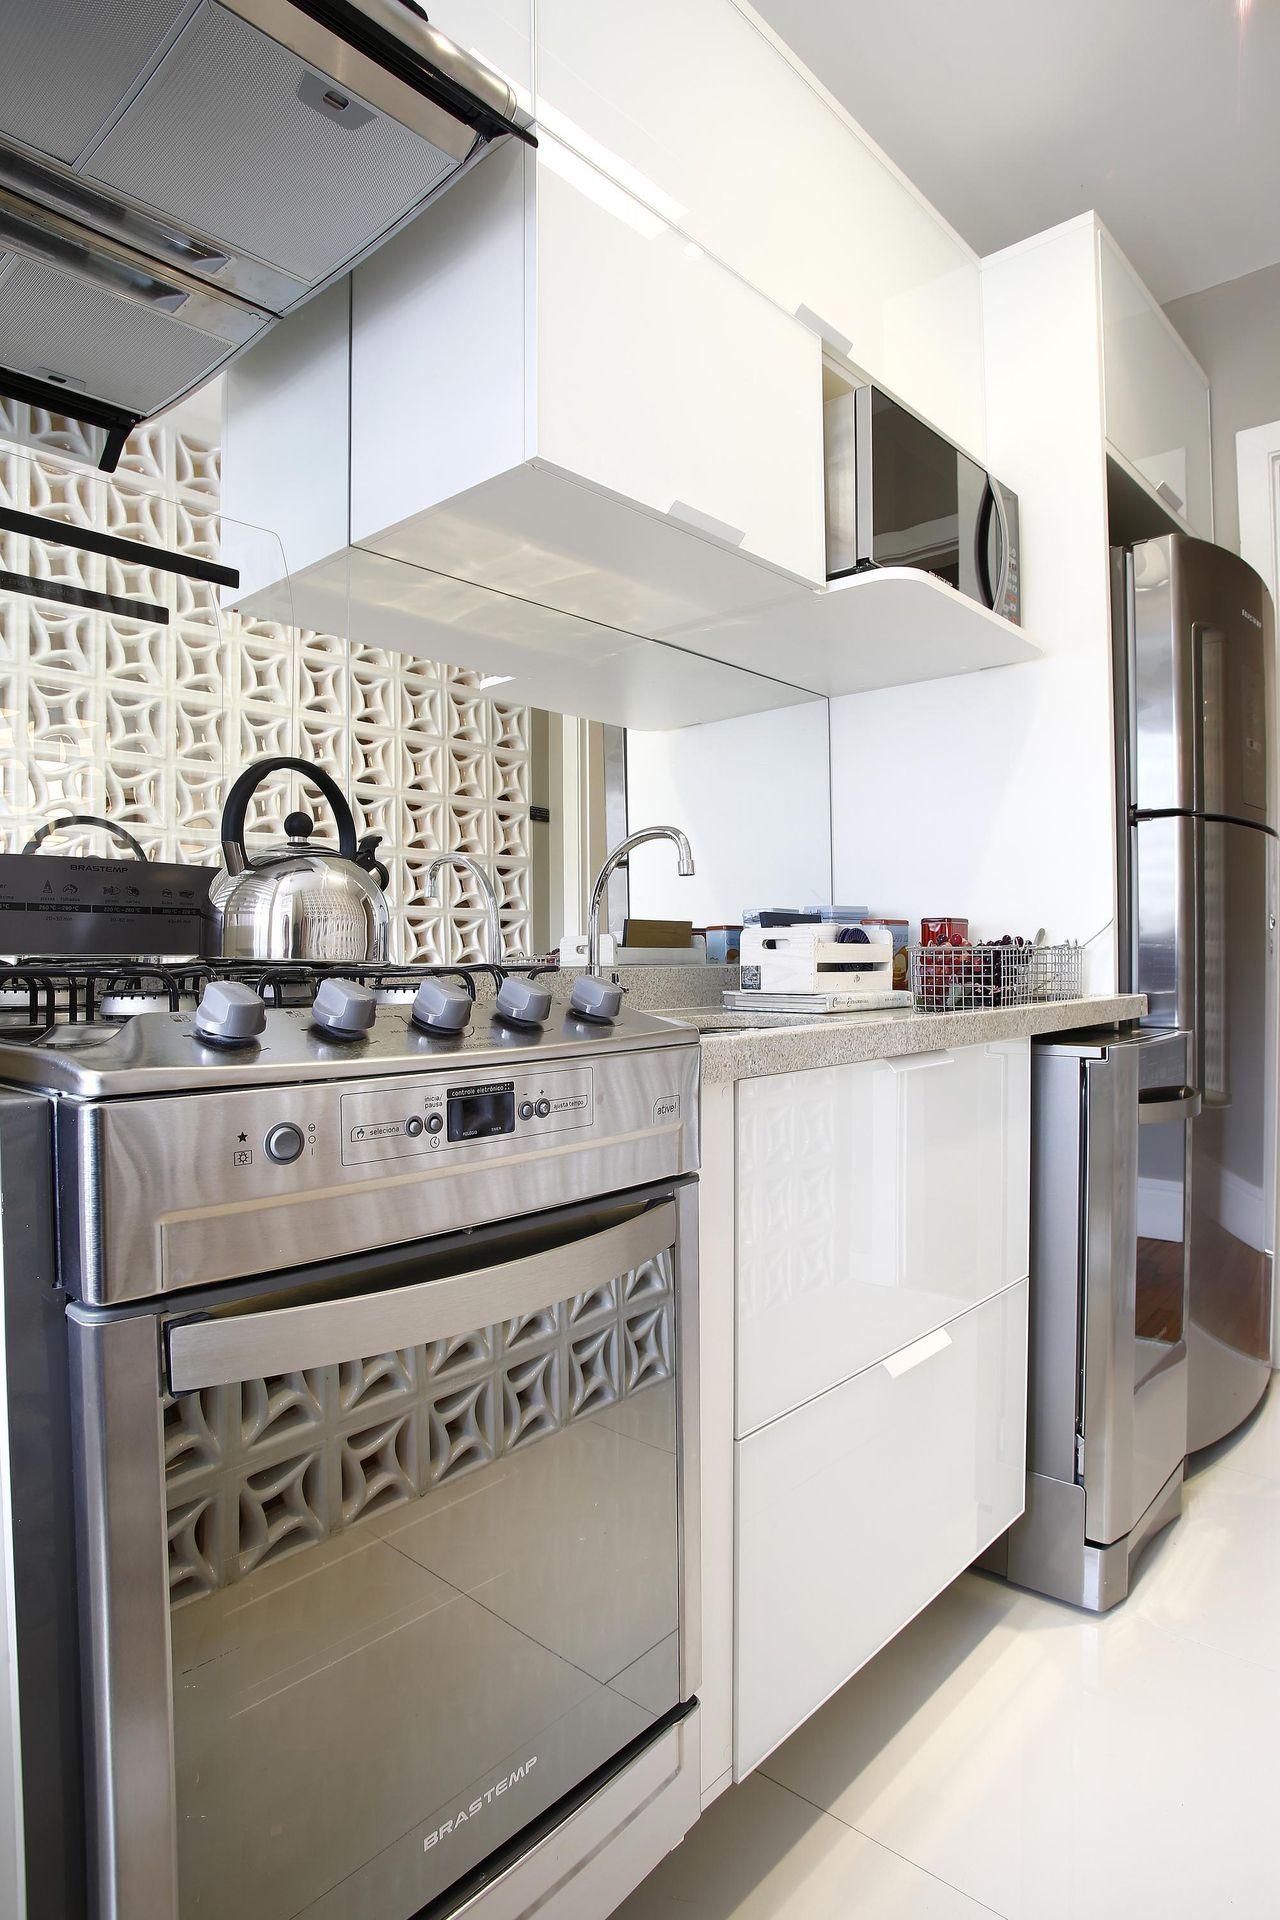 Granite countertops and built-in mirrored stove